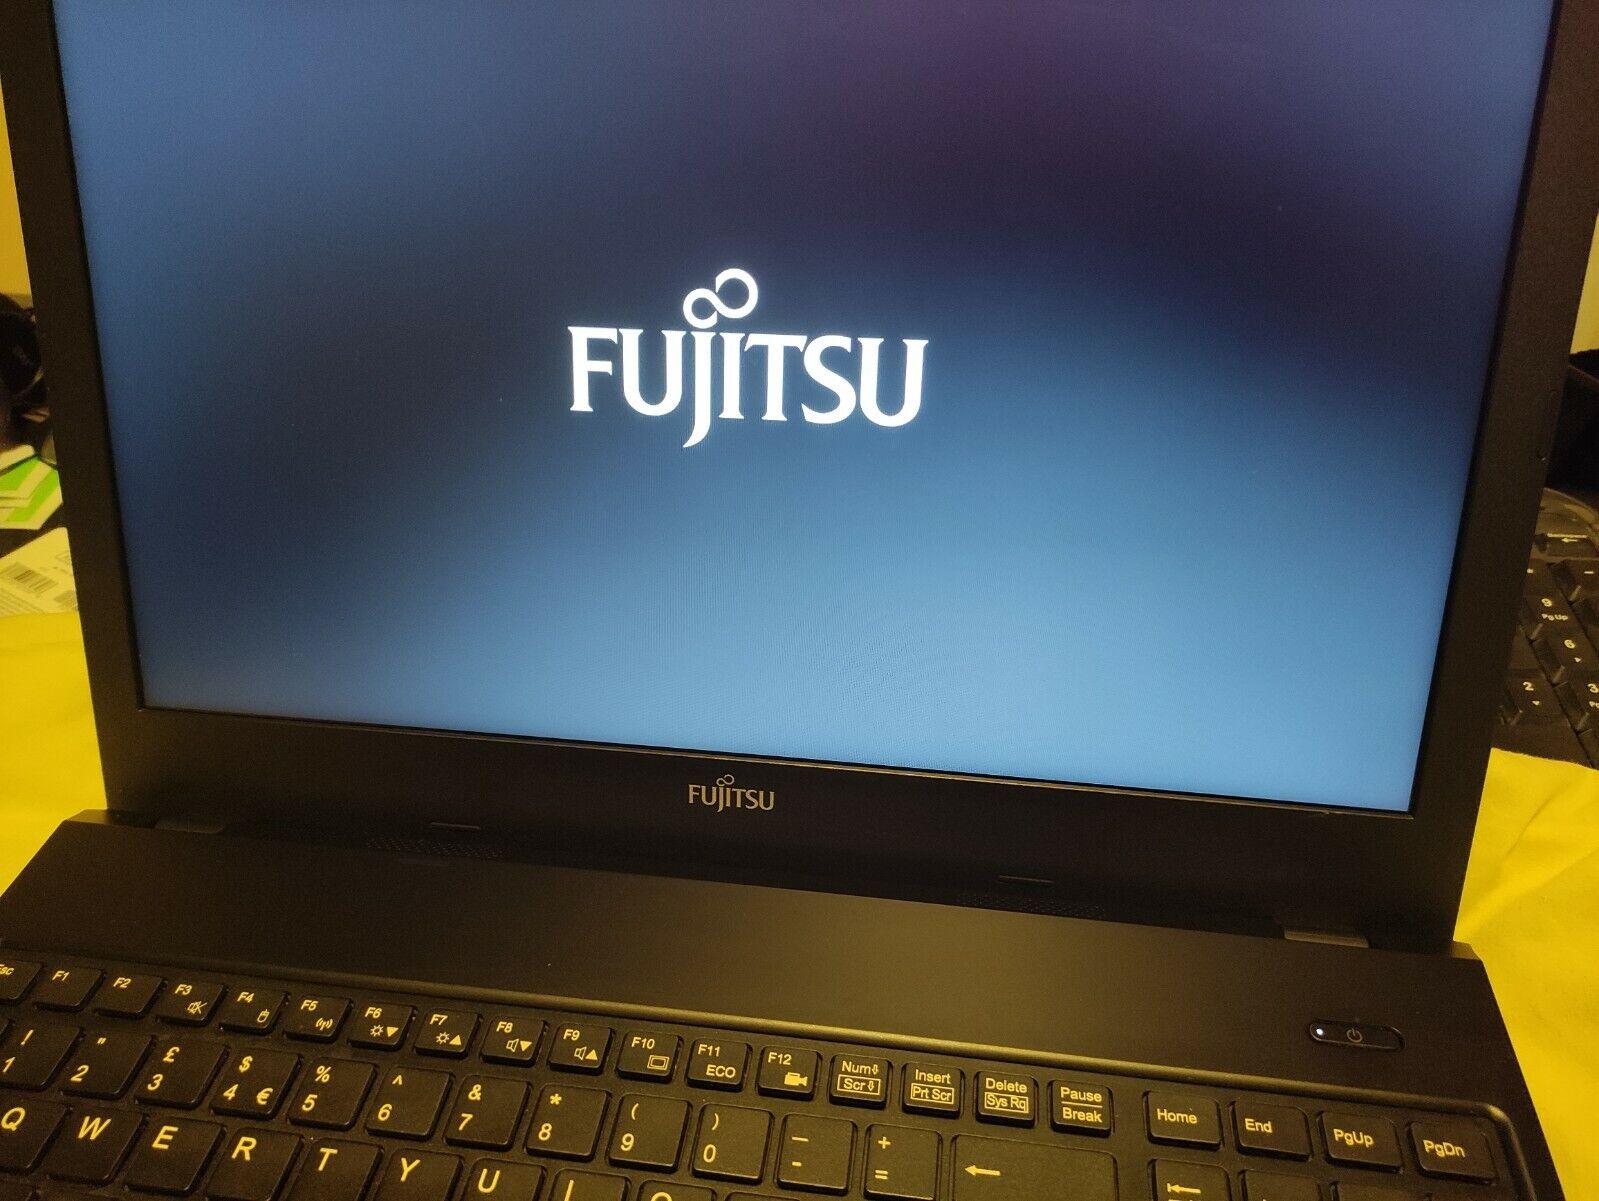 Laptop Windows - Windows 10 Laptop Fujitsu A555 - i5-5200U 2.2GHz, 4GB RAM, 120GB SSD Very Good